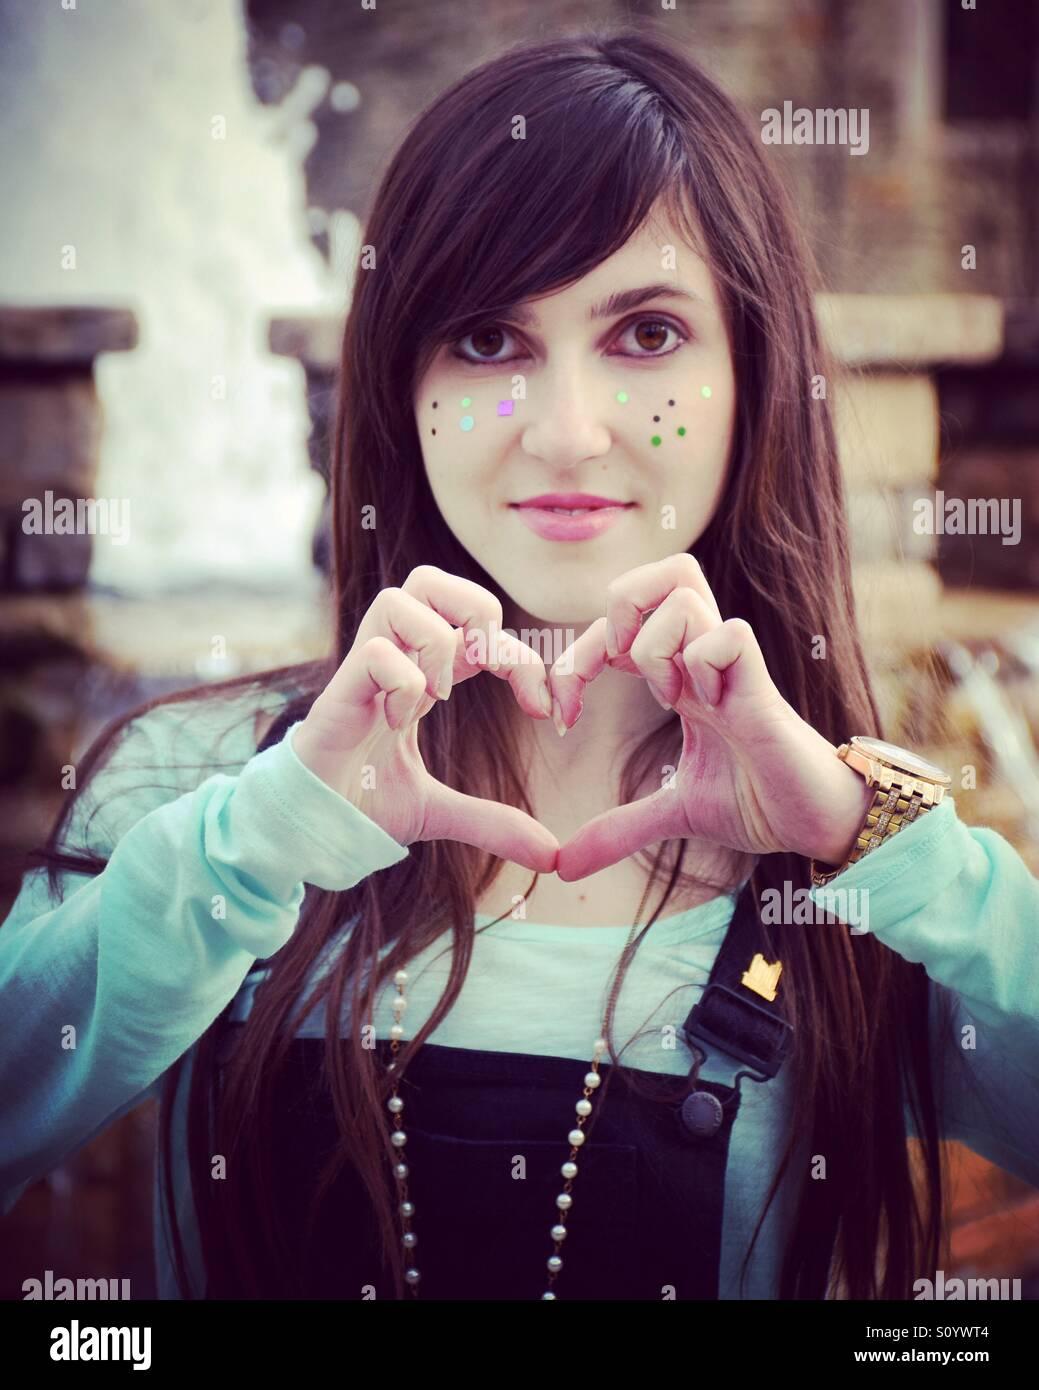 Love - Stock Image